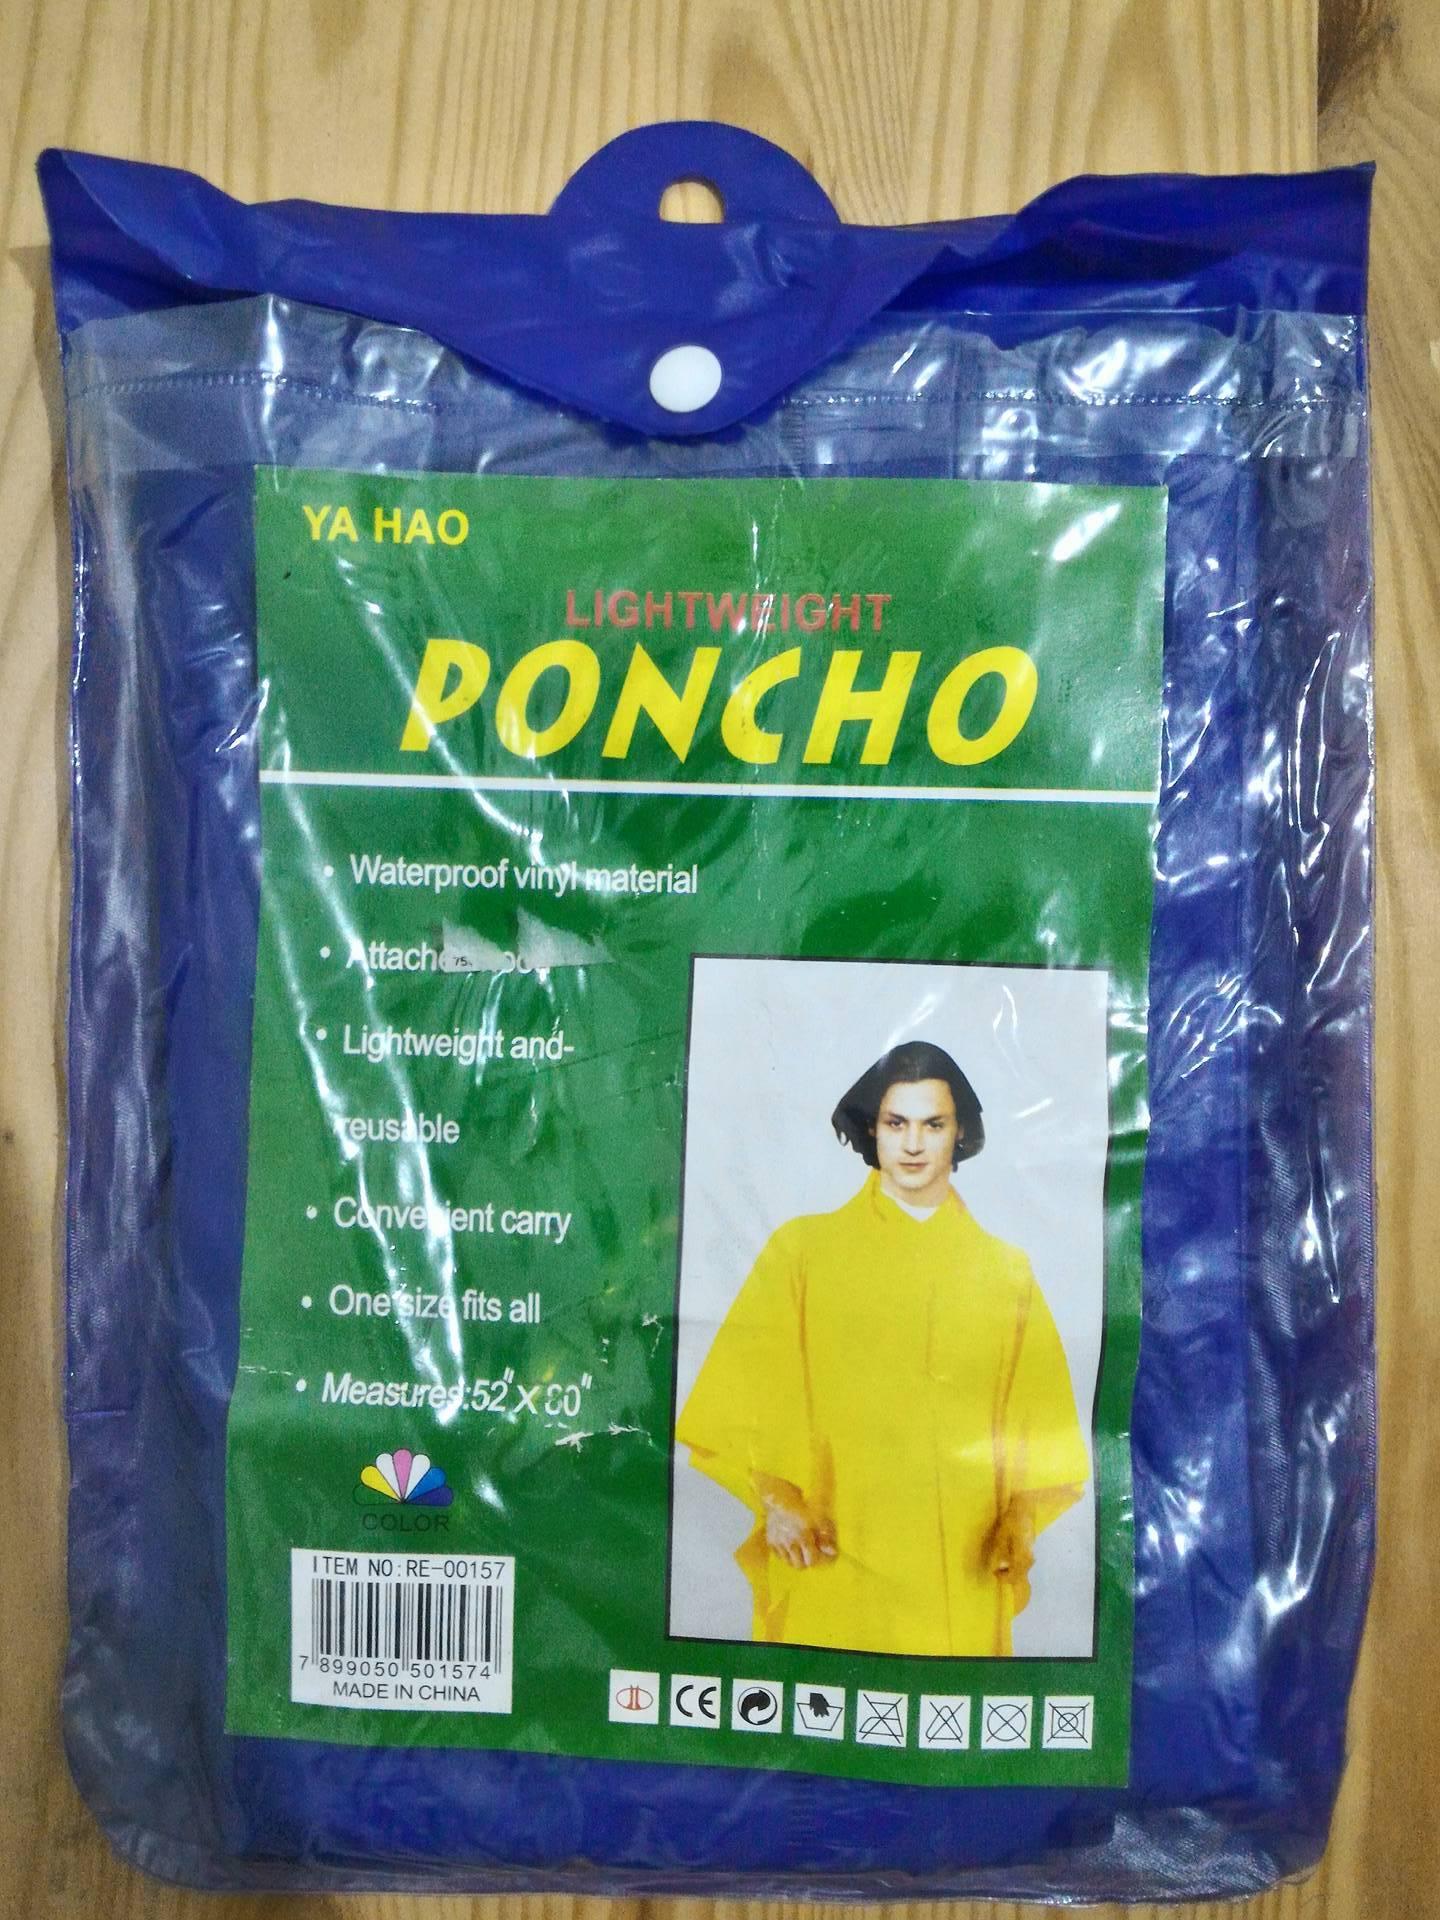 Ya Hao Lightweight Poncho